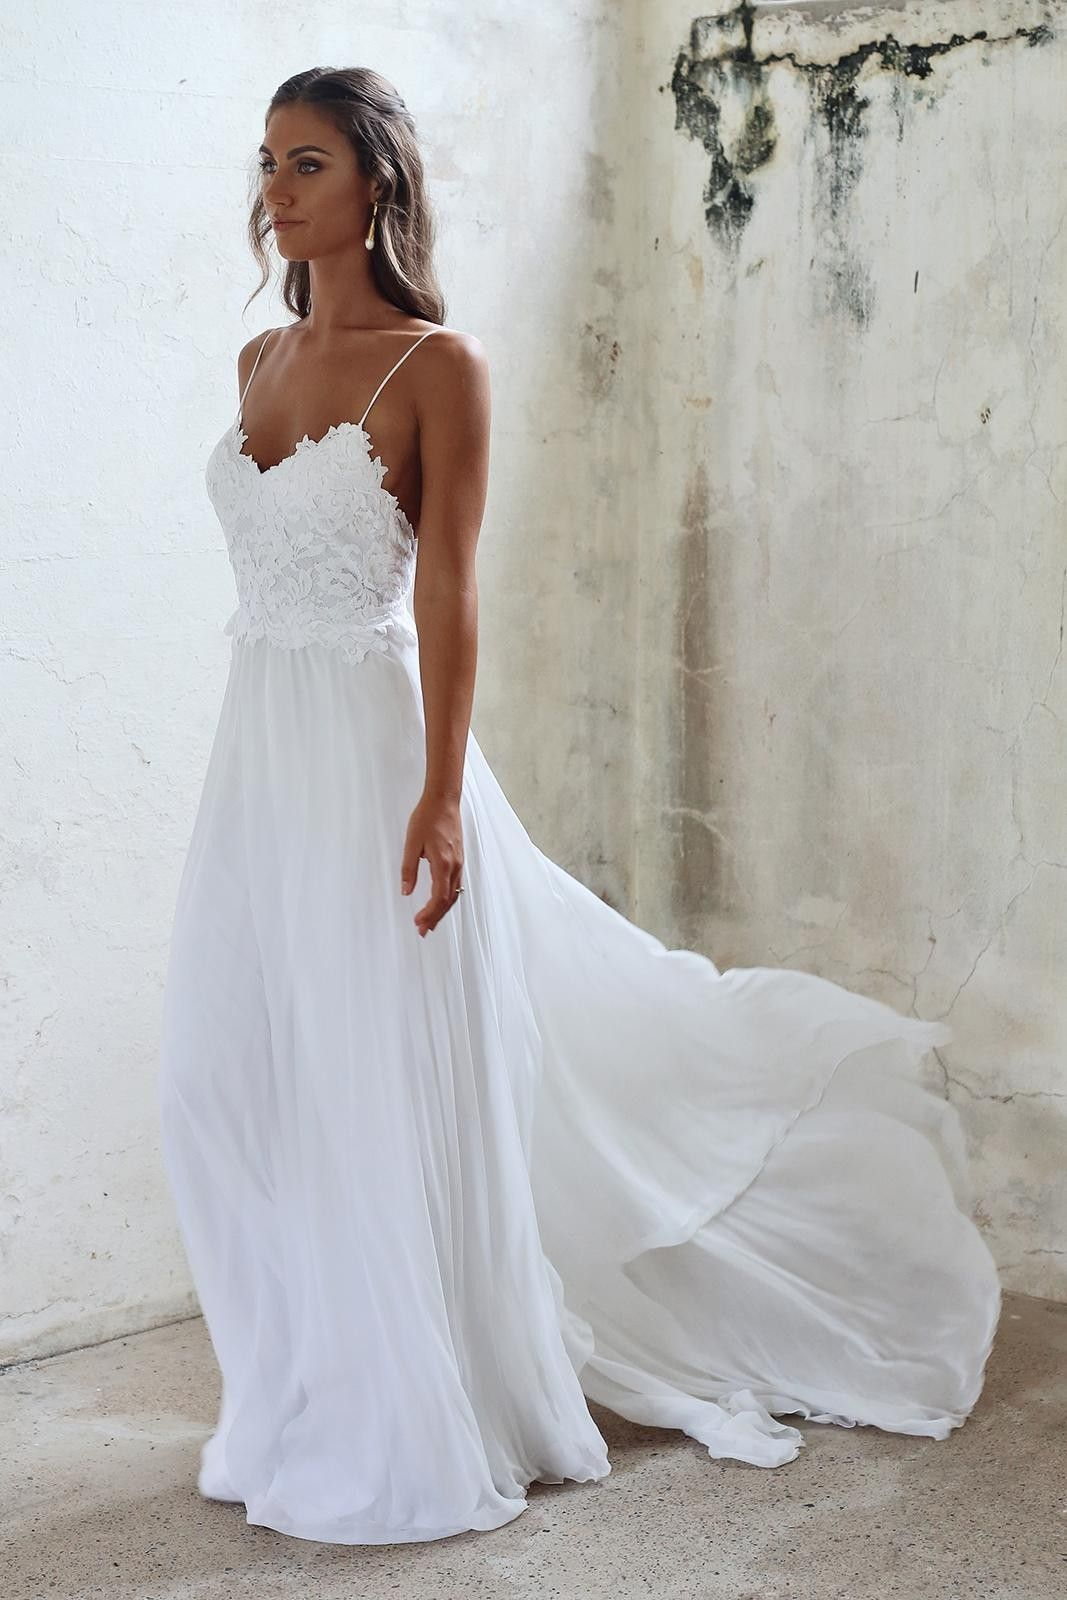 Simple A Line Spaghetti Straps Open Back Summer Wedding Dress White Beach Wedding Dresses Beach Wedding Dress Boho Coast Wedding Dress